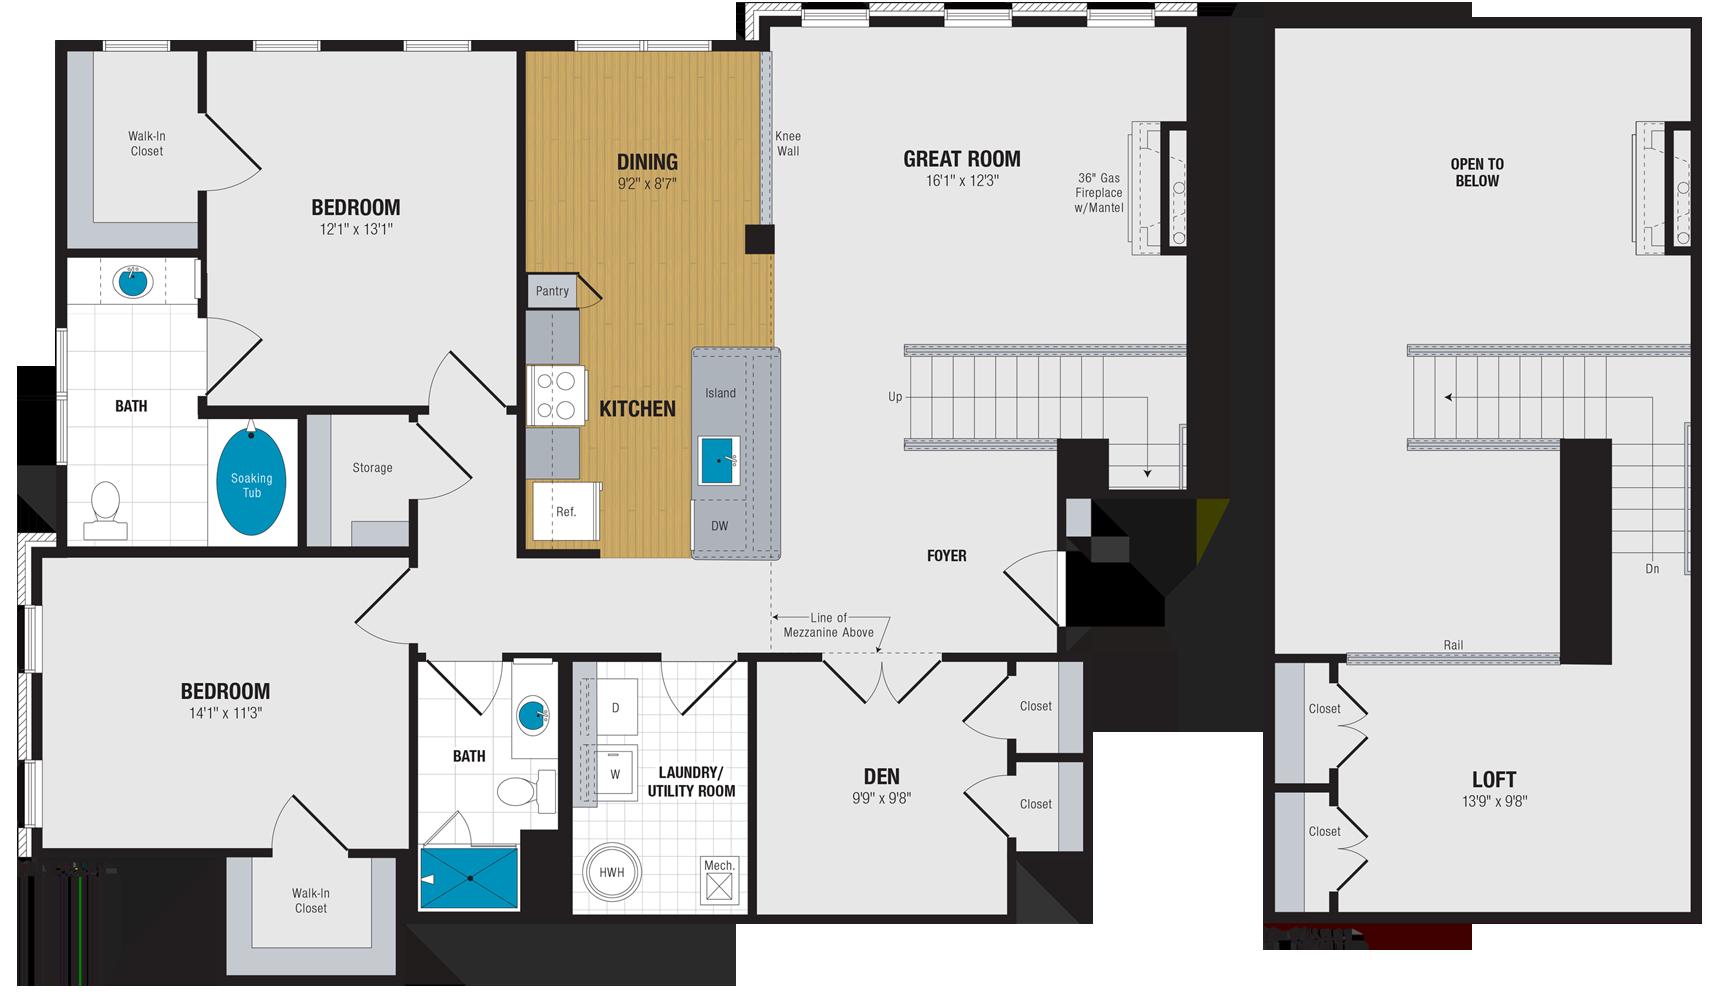 Md abingdon theenclaveatboxhill p0663789 34570722196464 2 floorplan